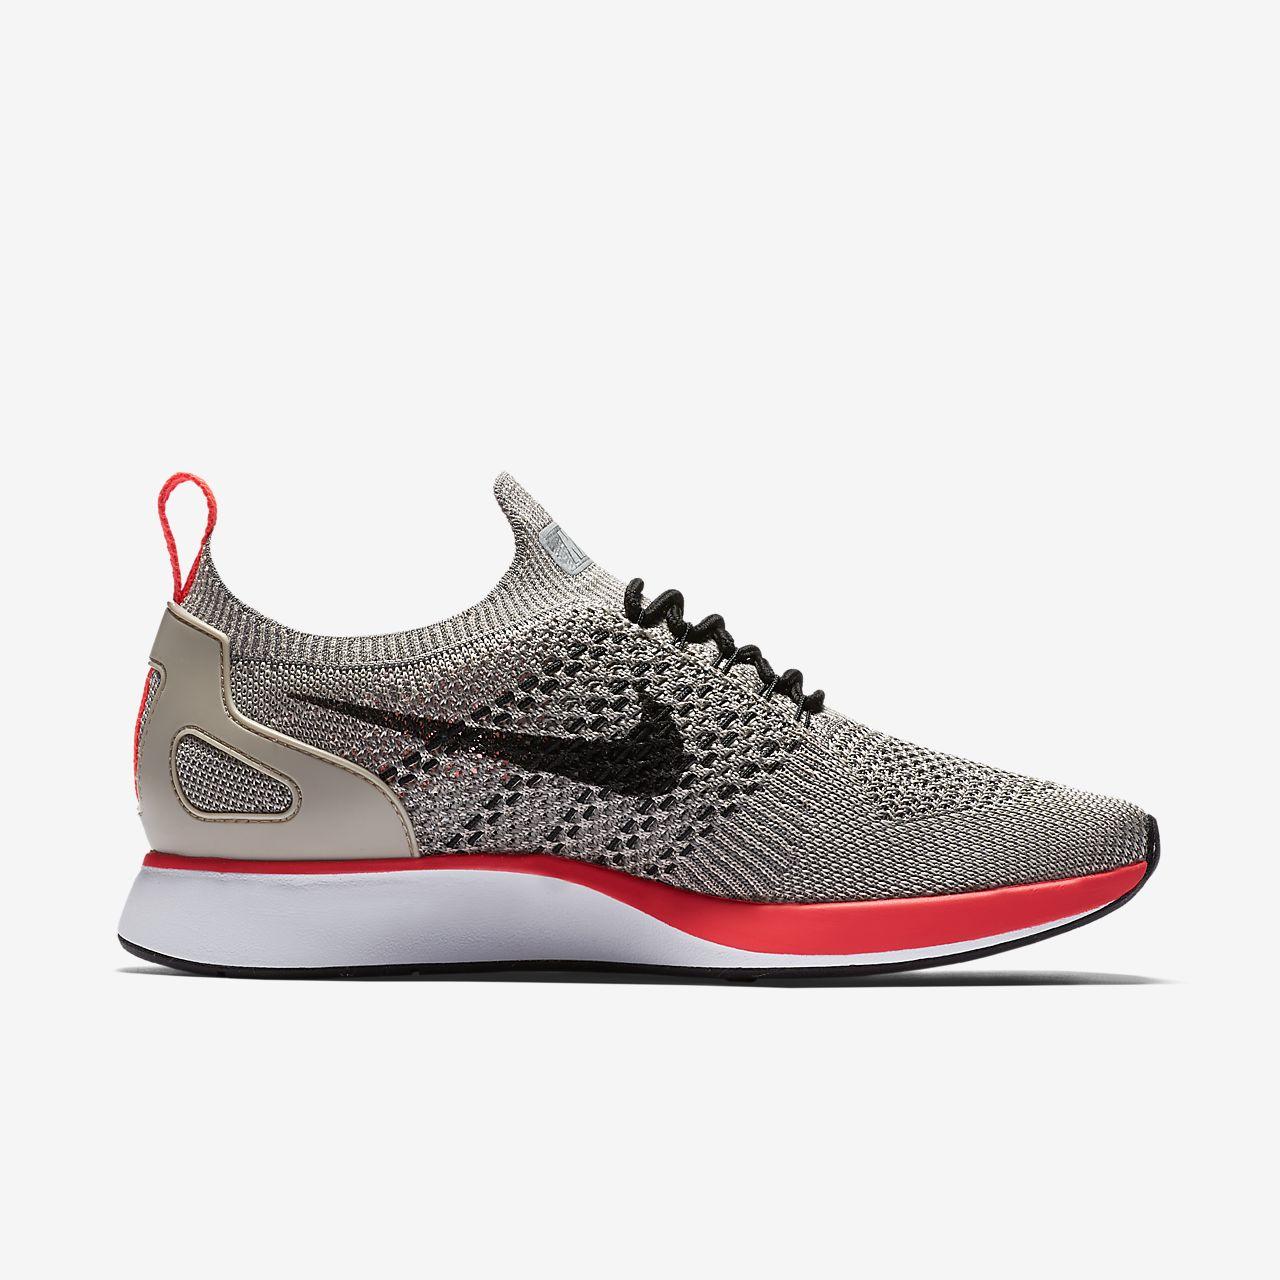 boutique avec confiance Nike Flyknit Racer Mariah Running Shoe For Sale